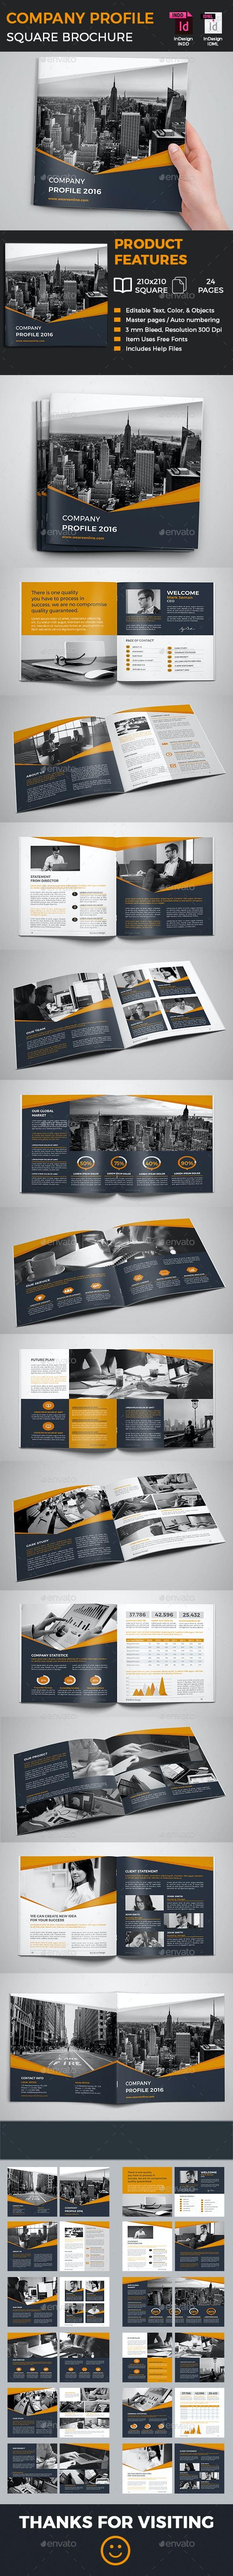 The Company Profile Brochure - Corporate Brochures